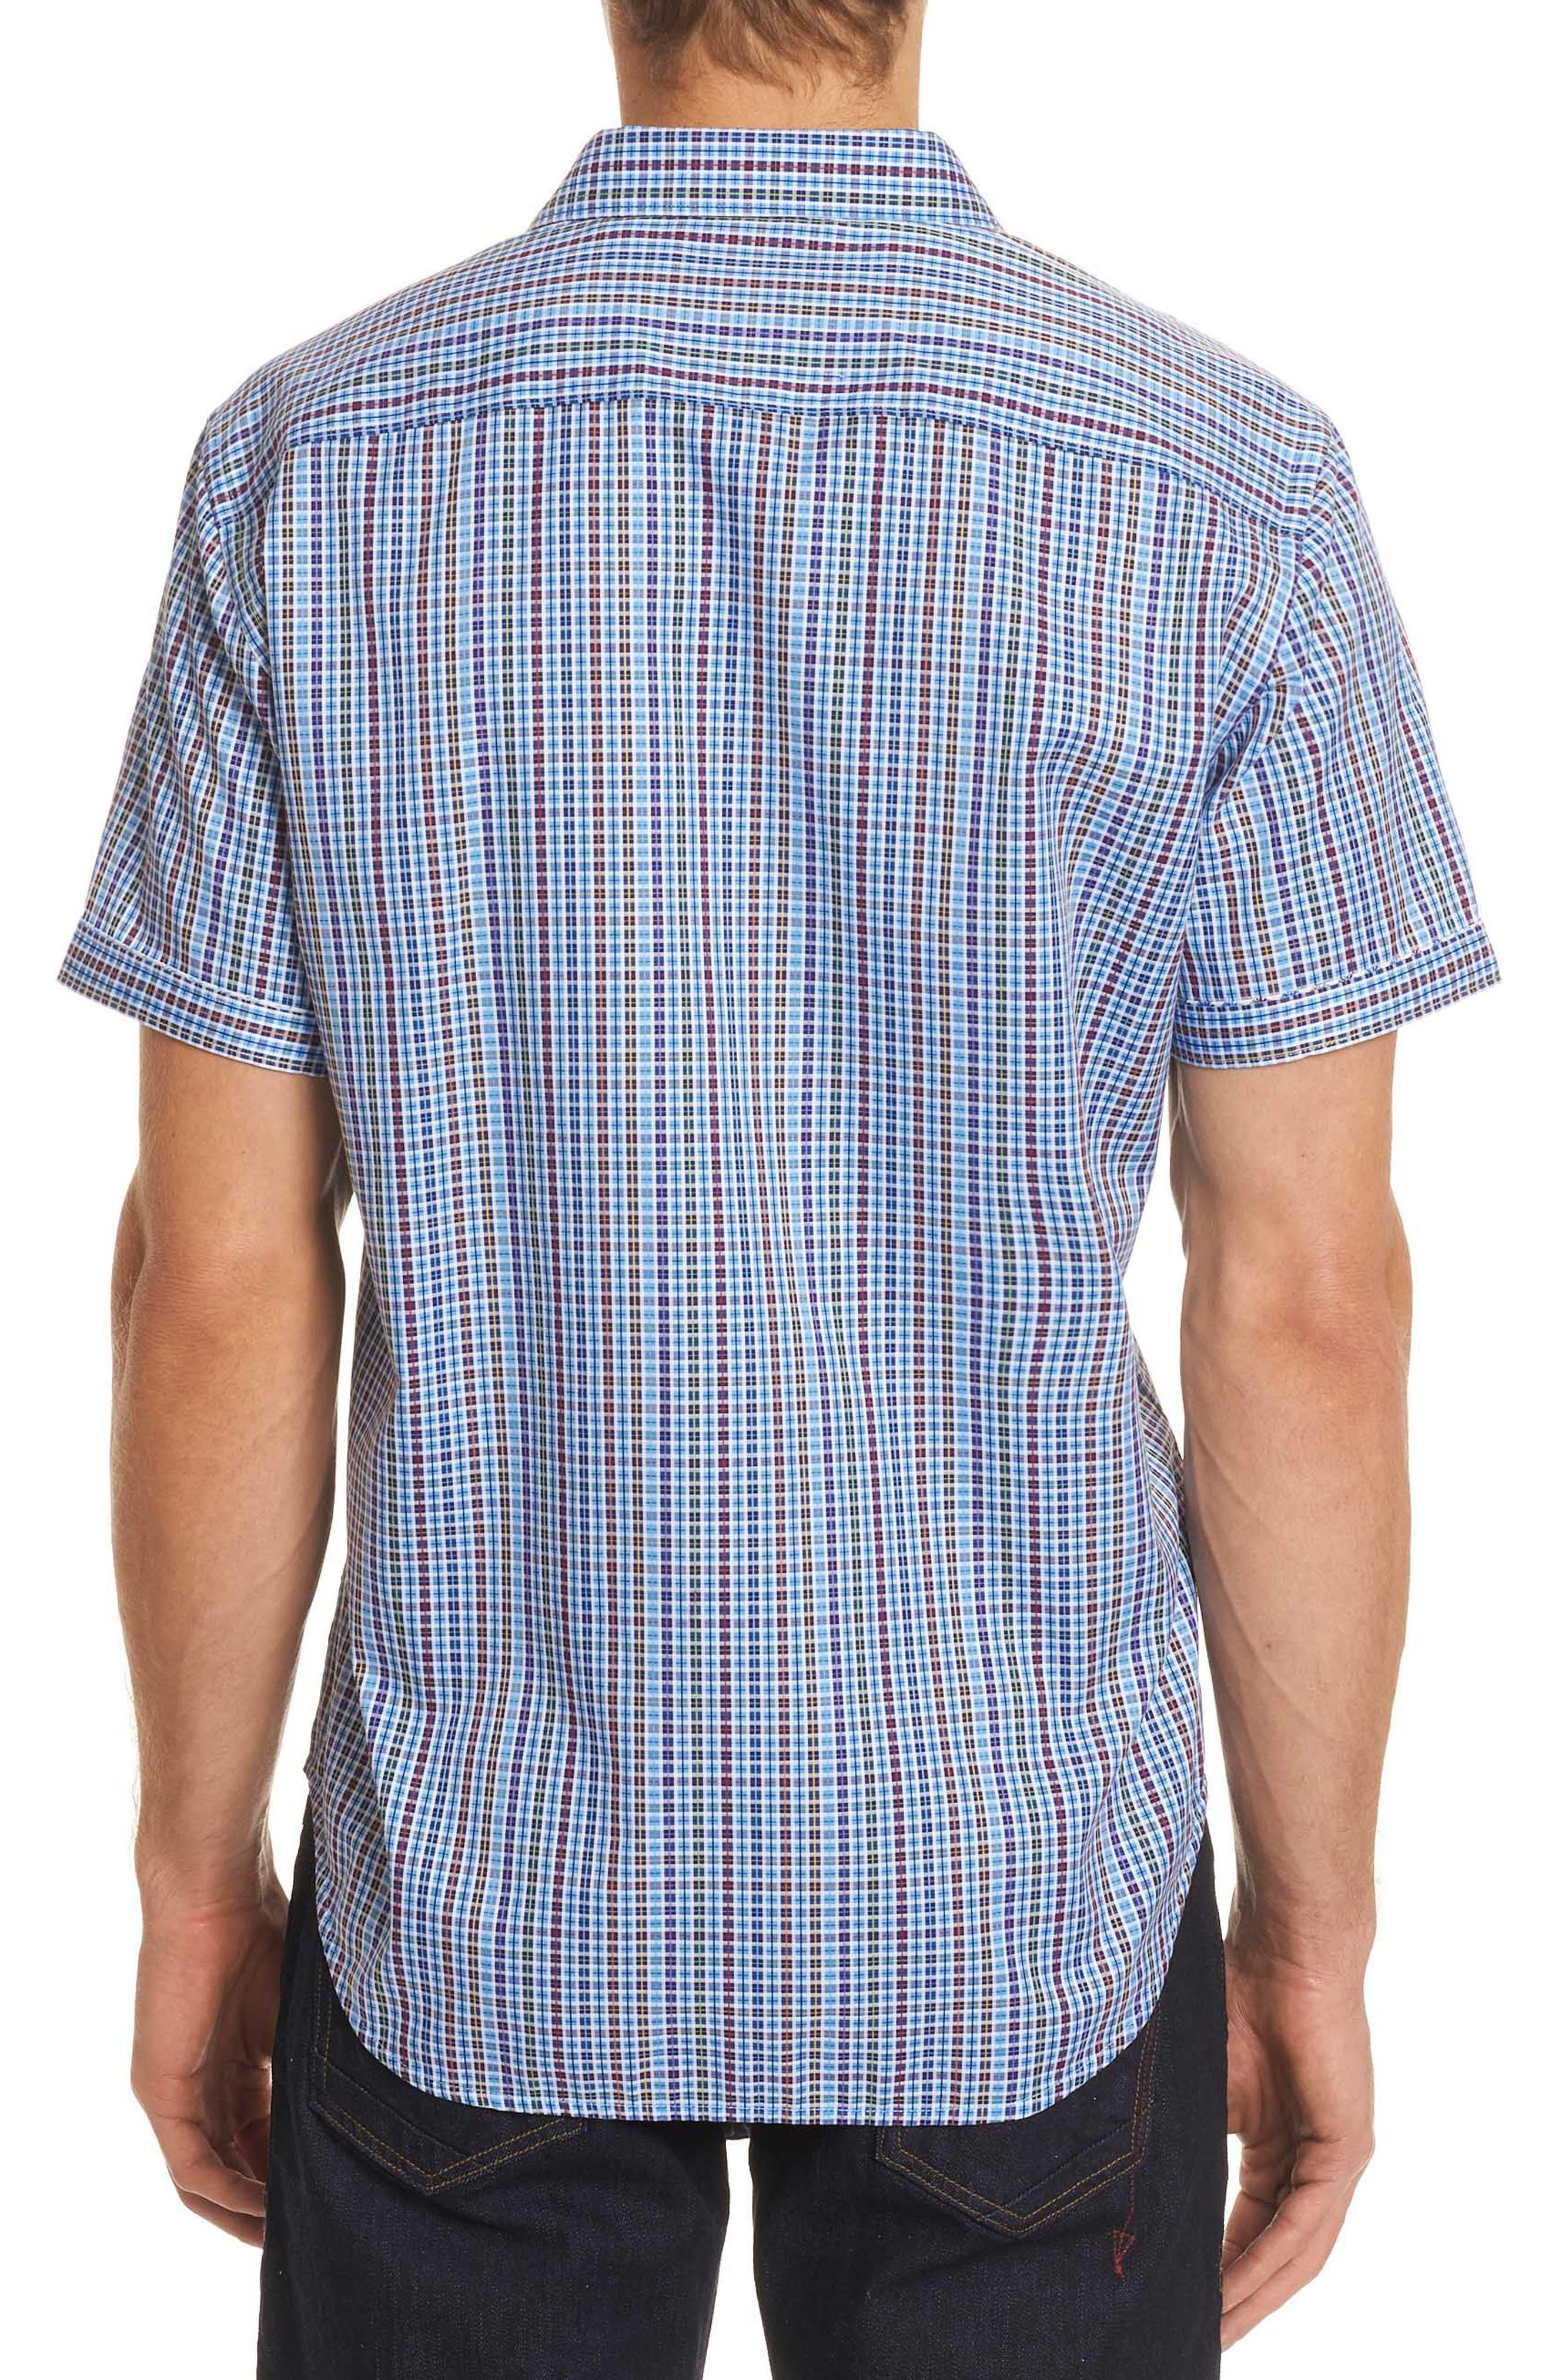 Palma Classic Fit Plaid Sport Shirt,                             Alternate thumbnail 2, color,                             450